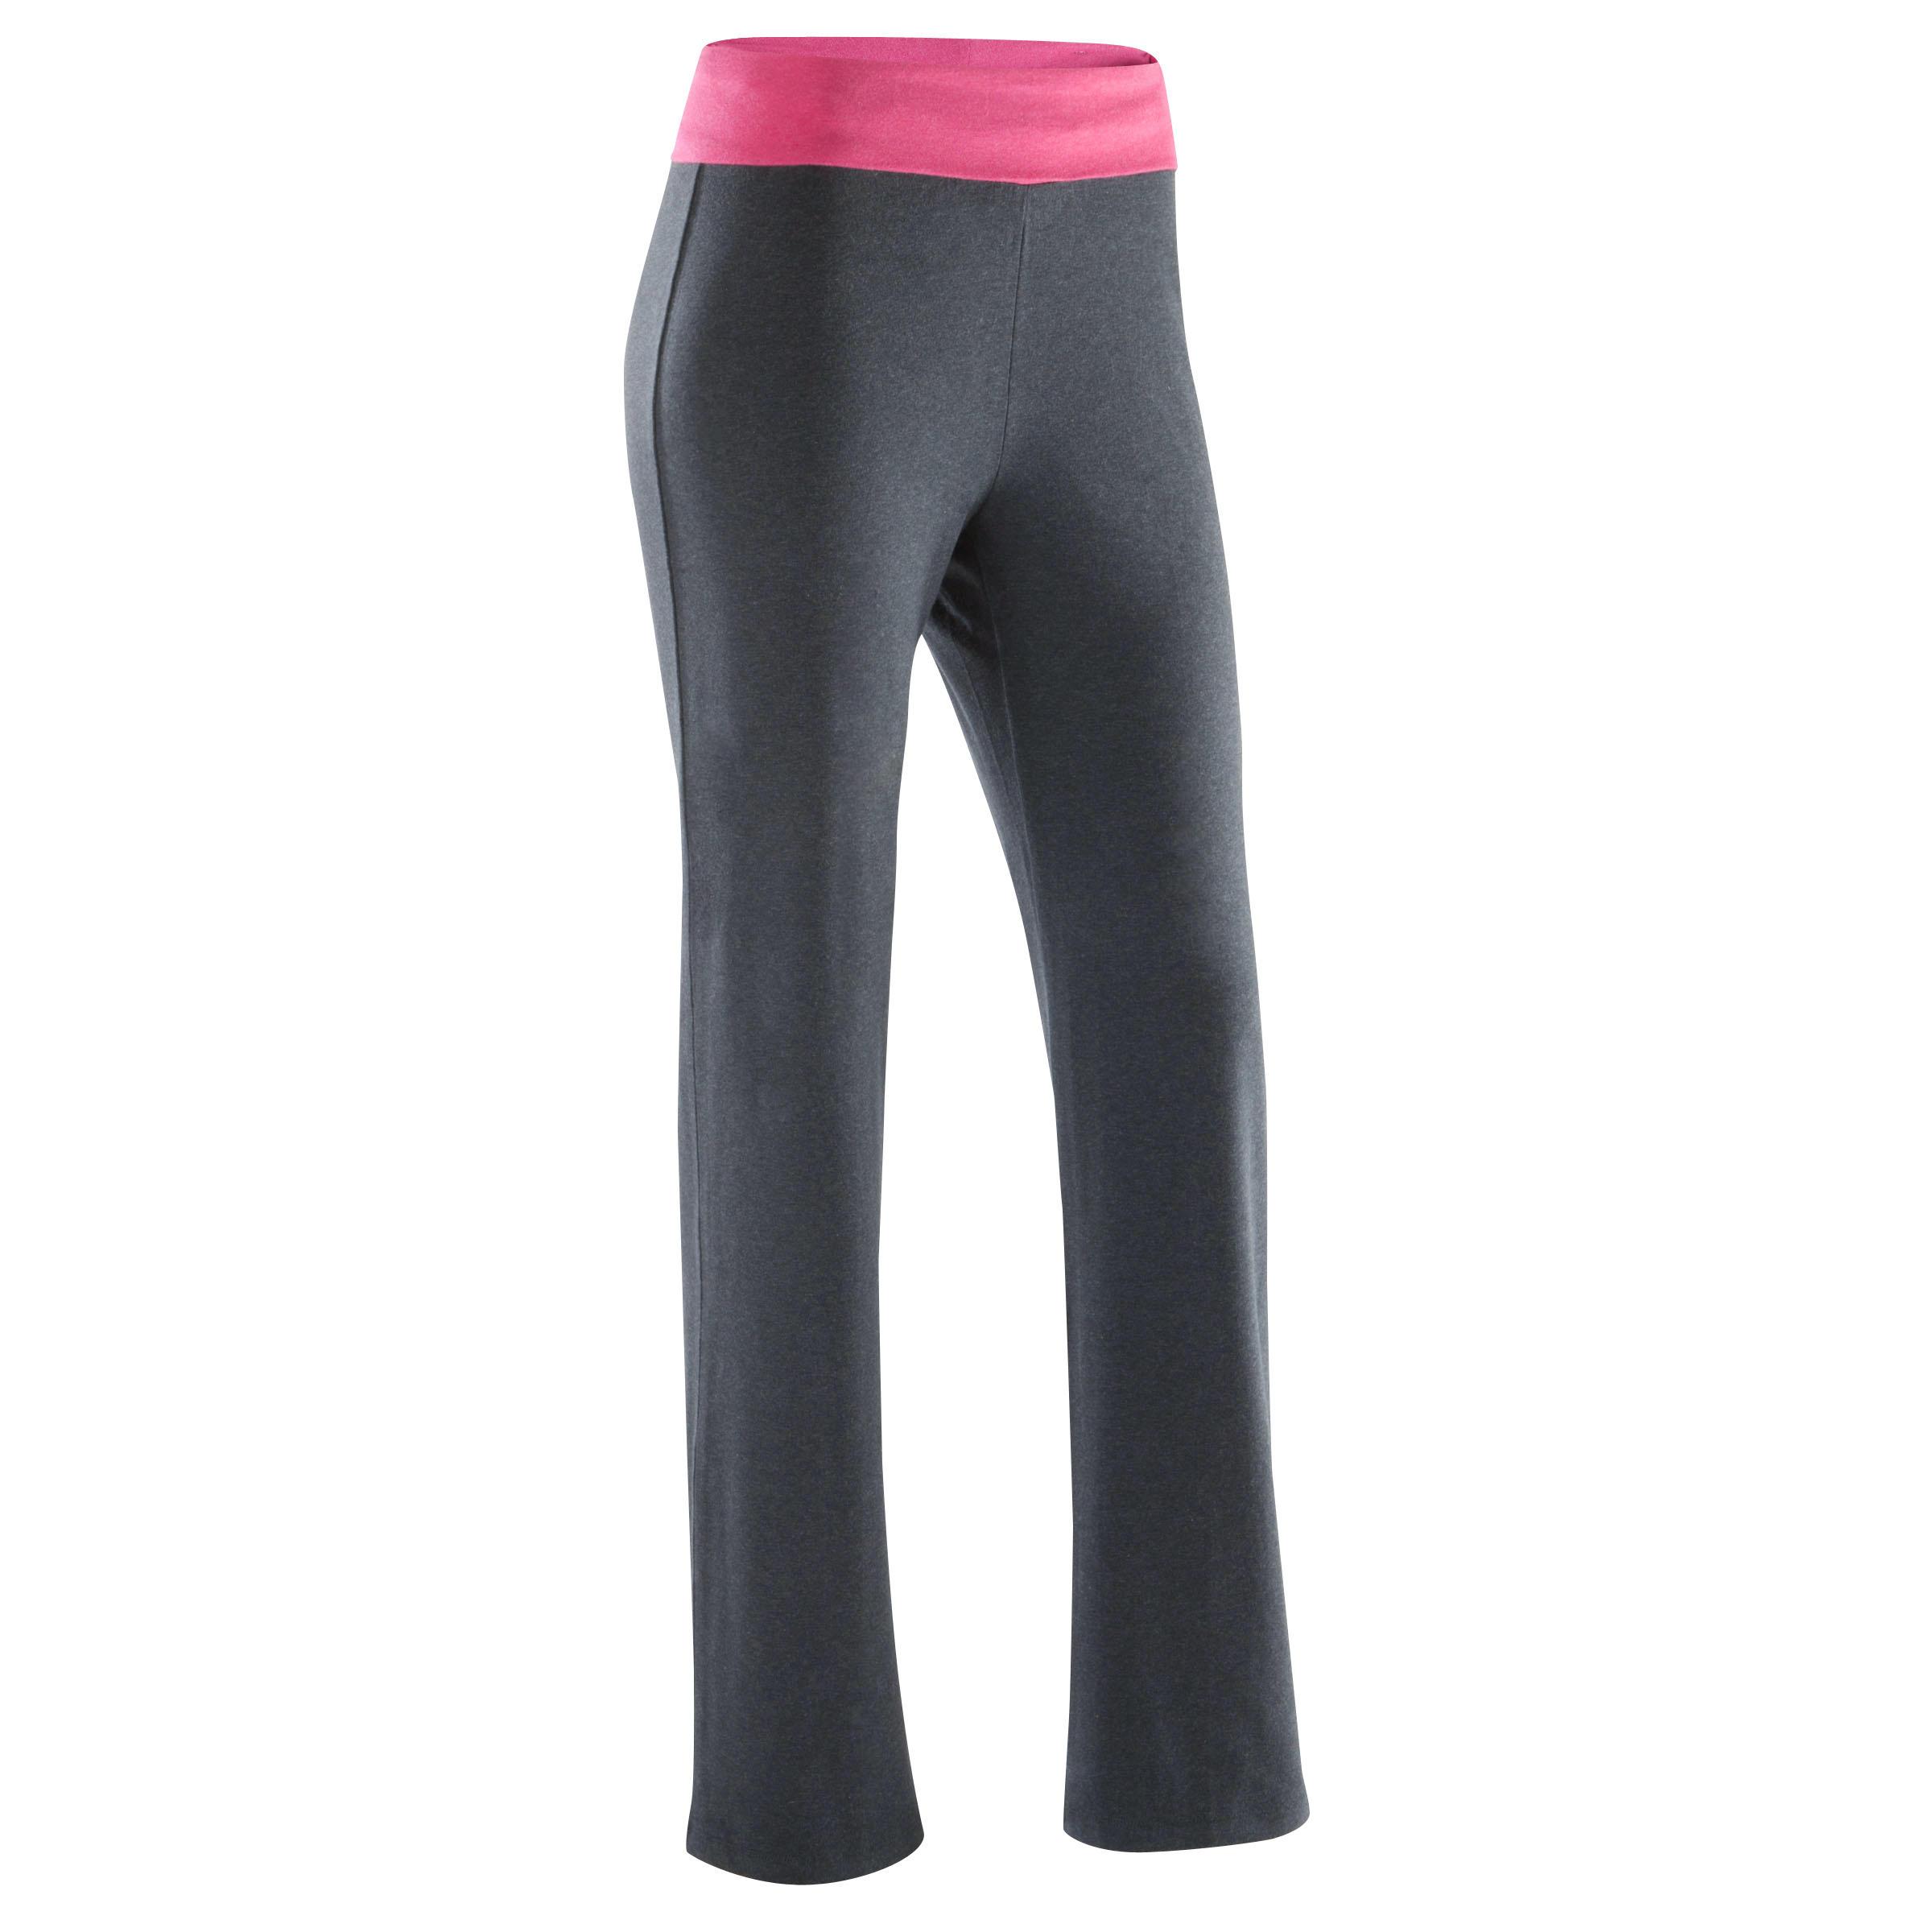 Pantalón yoga mujer algodón de cultivo biológico gris moteado / rosa